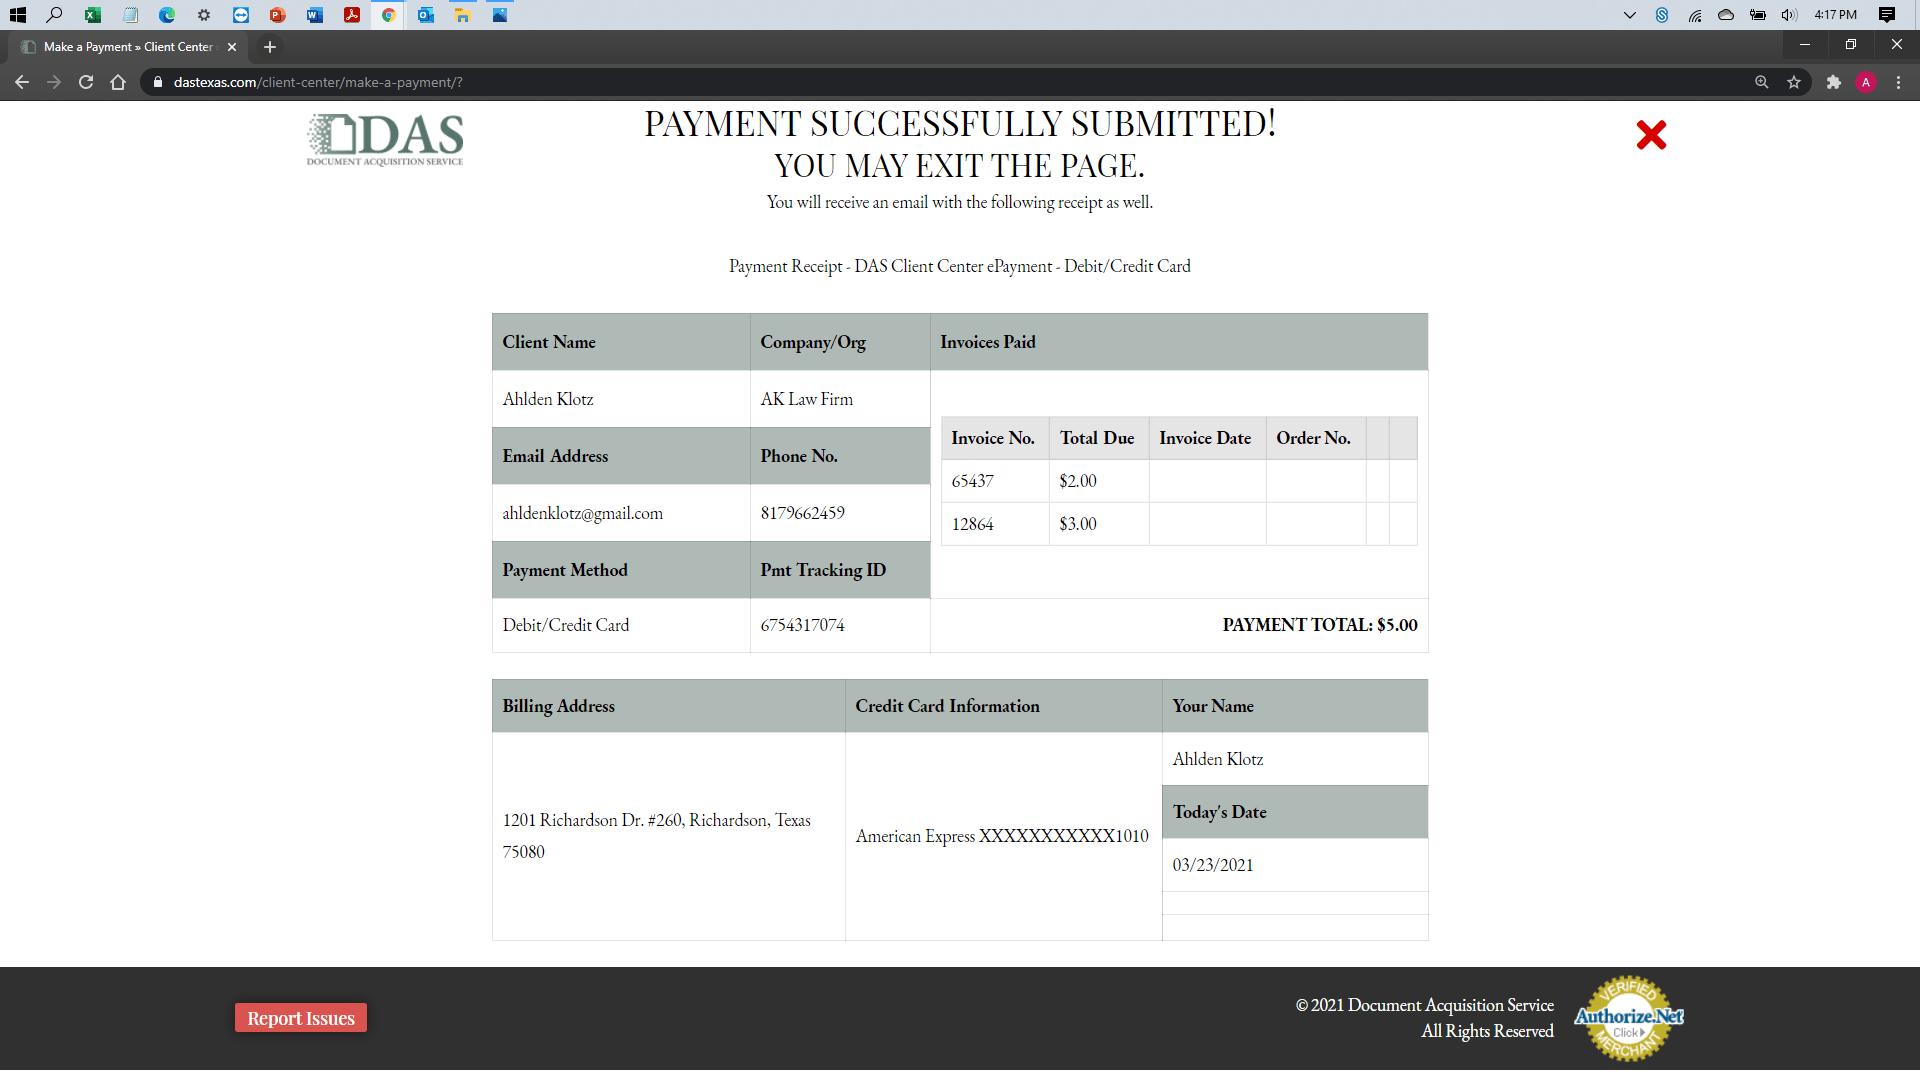 [help docs] Make a Payment - Credit Debit - Payment Success